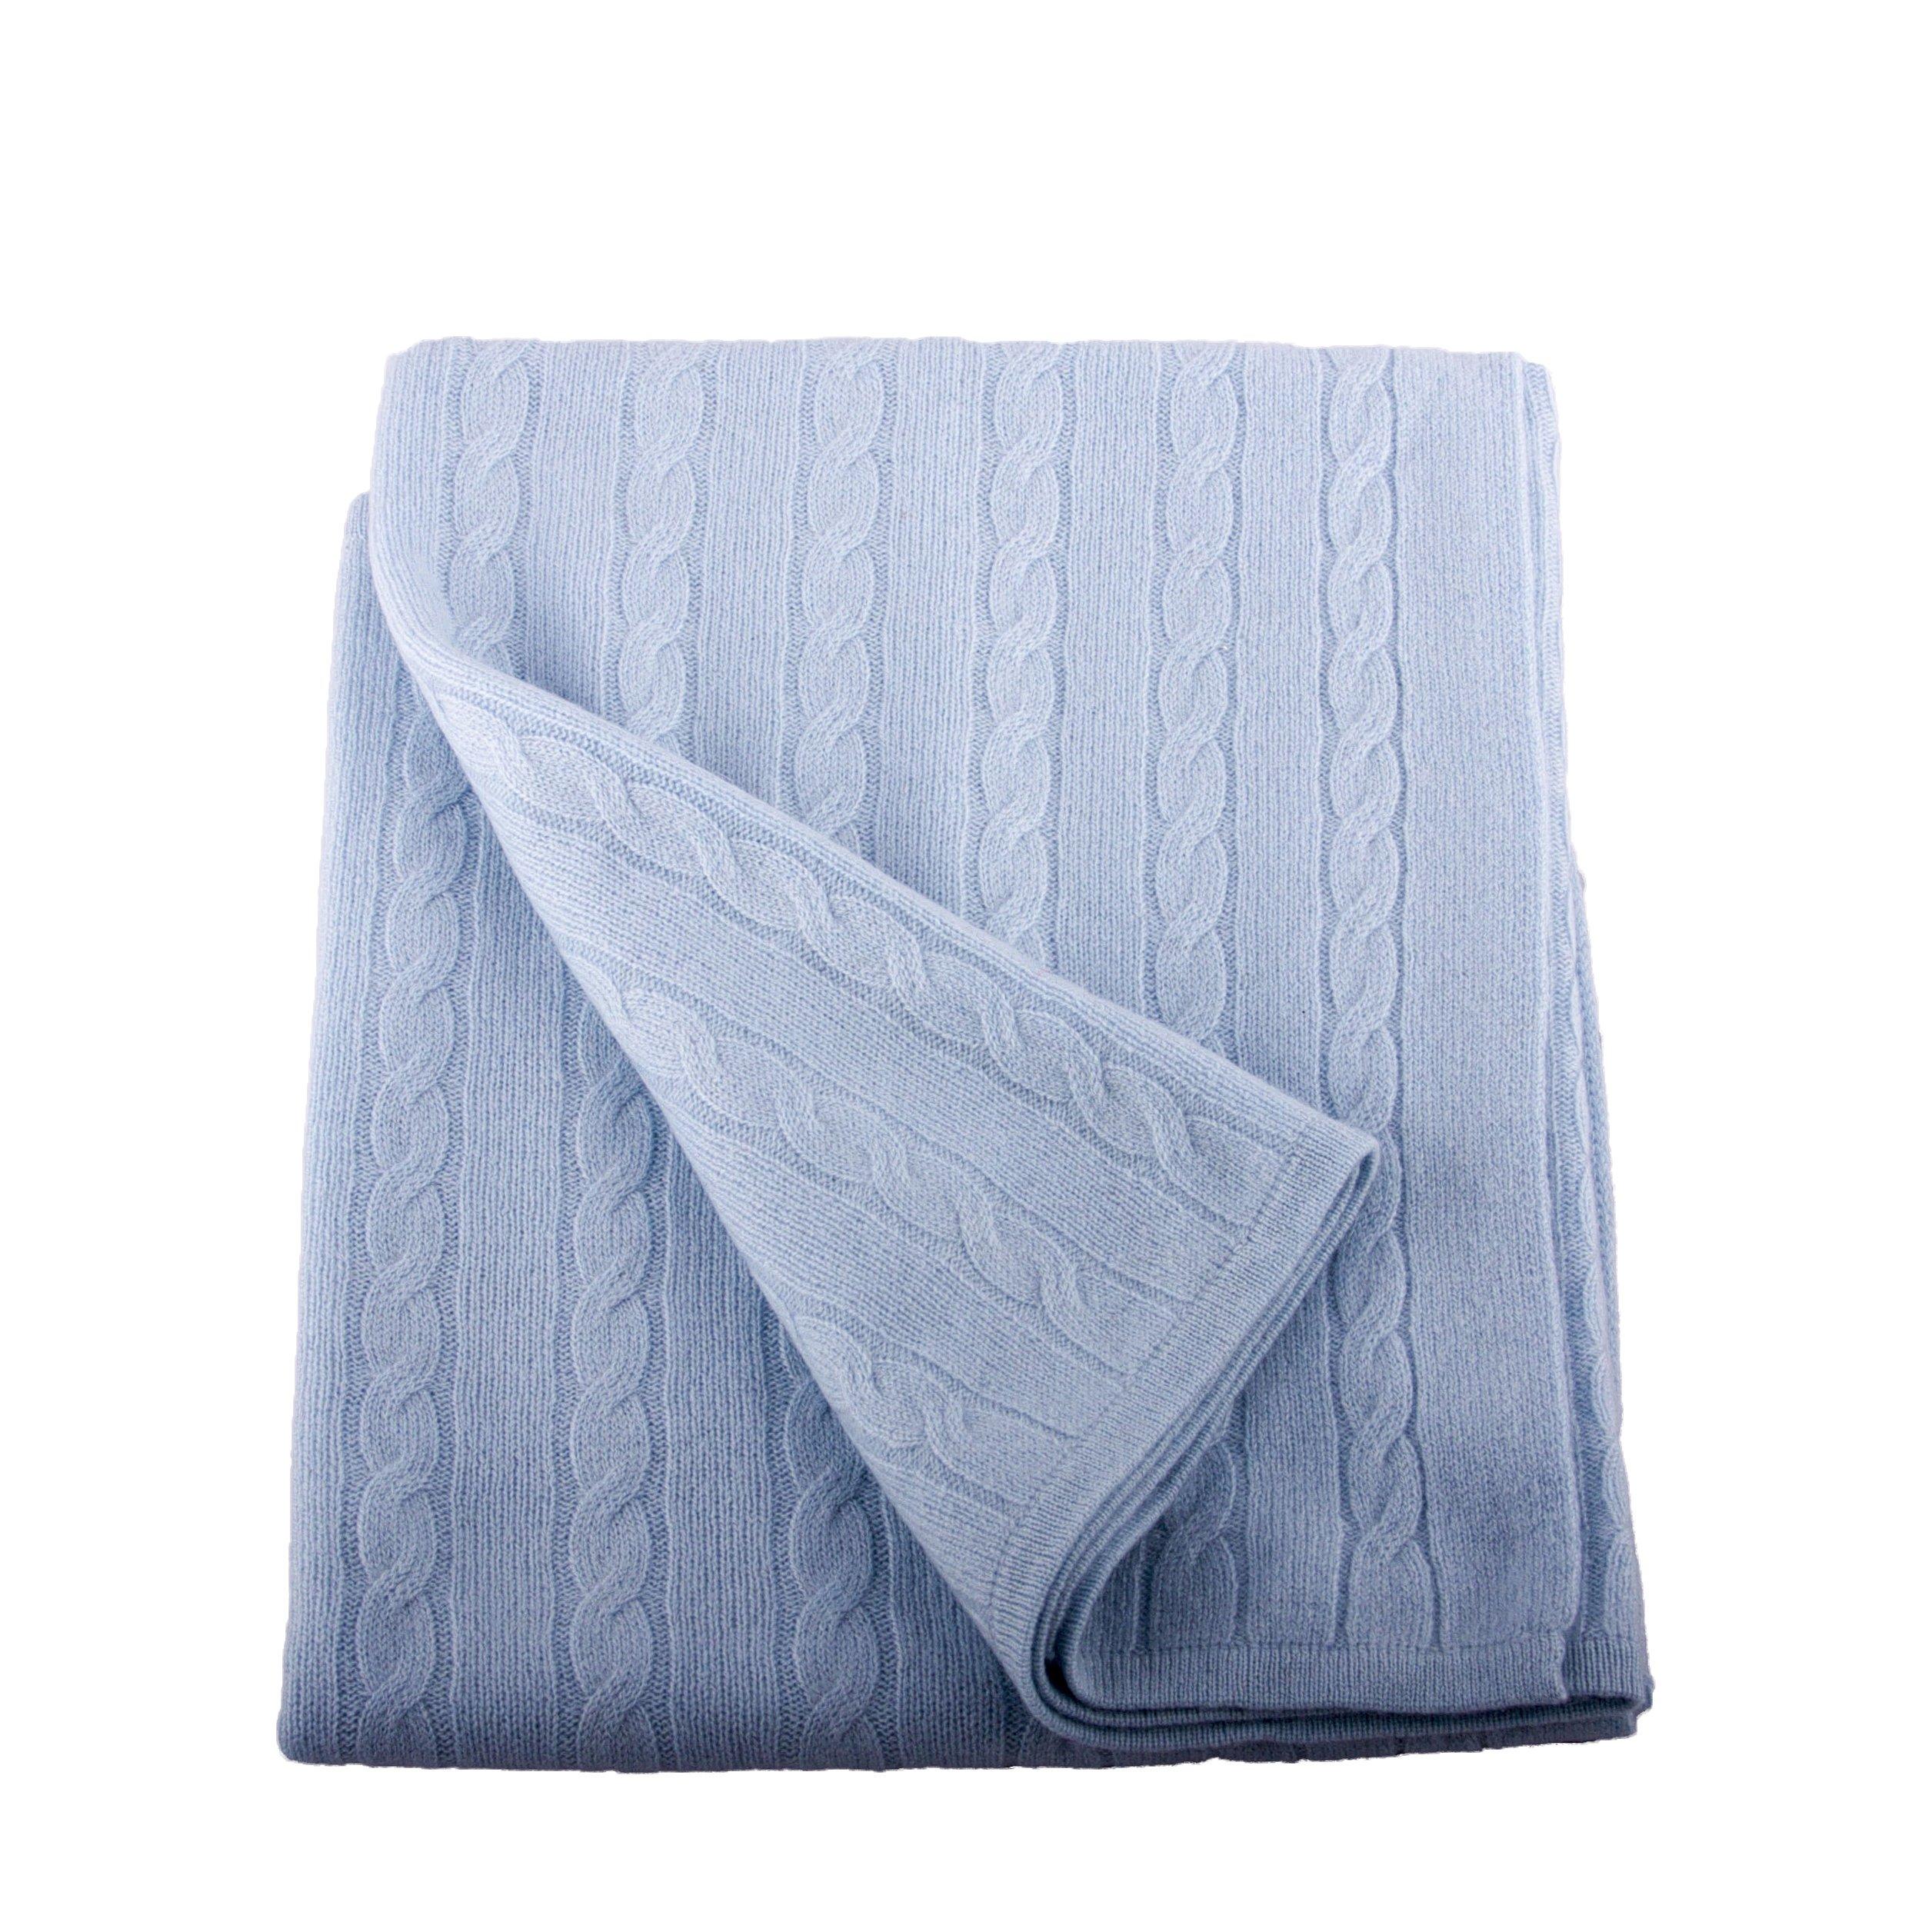 Lucky Bird Cashmere 100% Cashmere Baby Blanket, Sky Blue